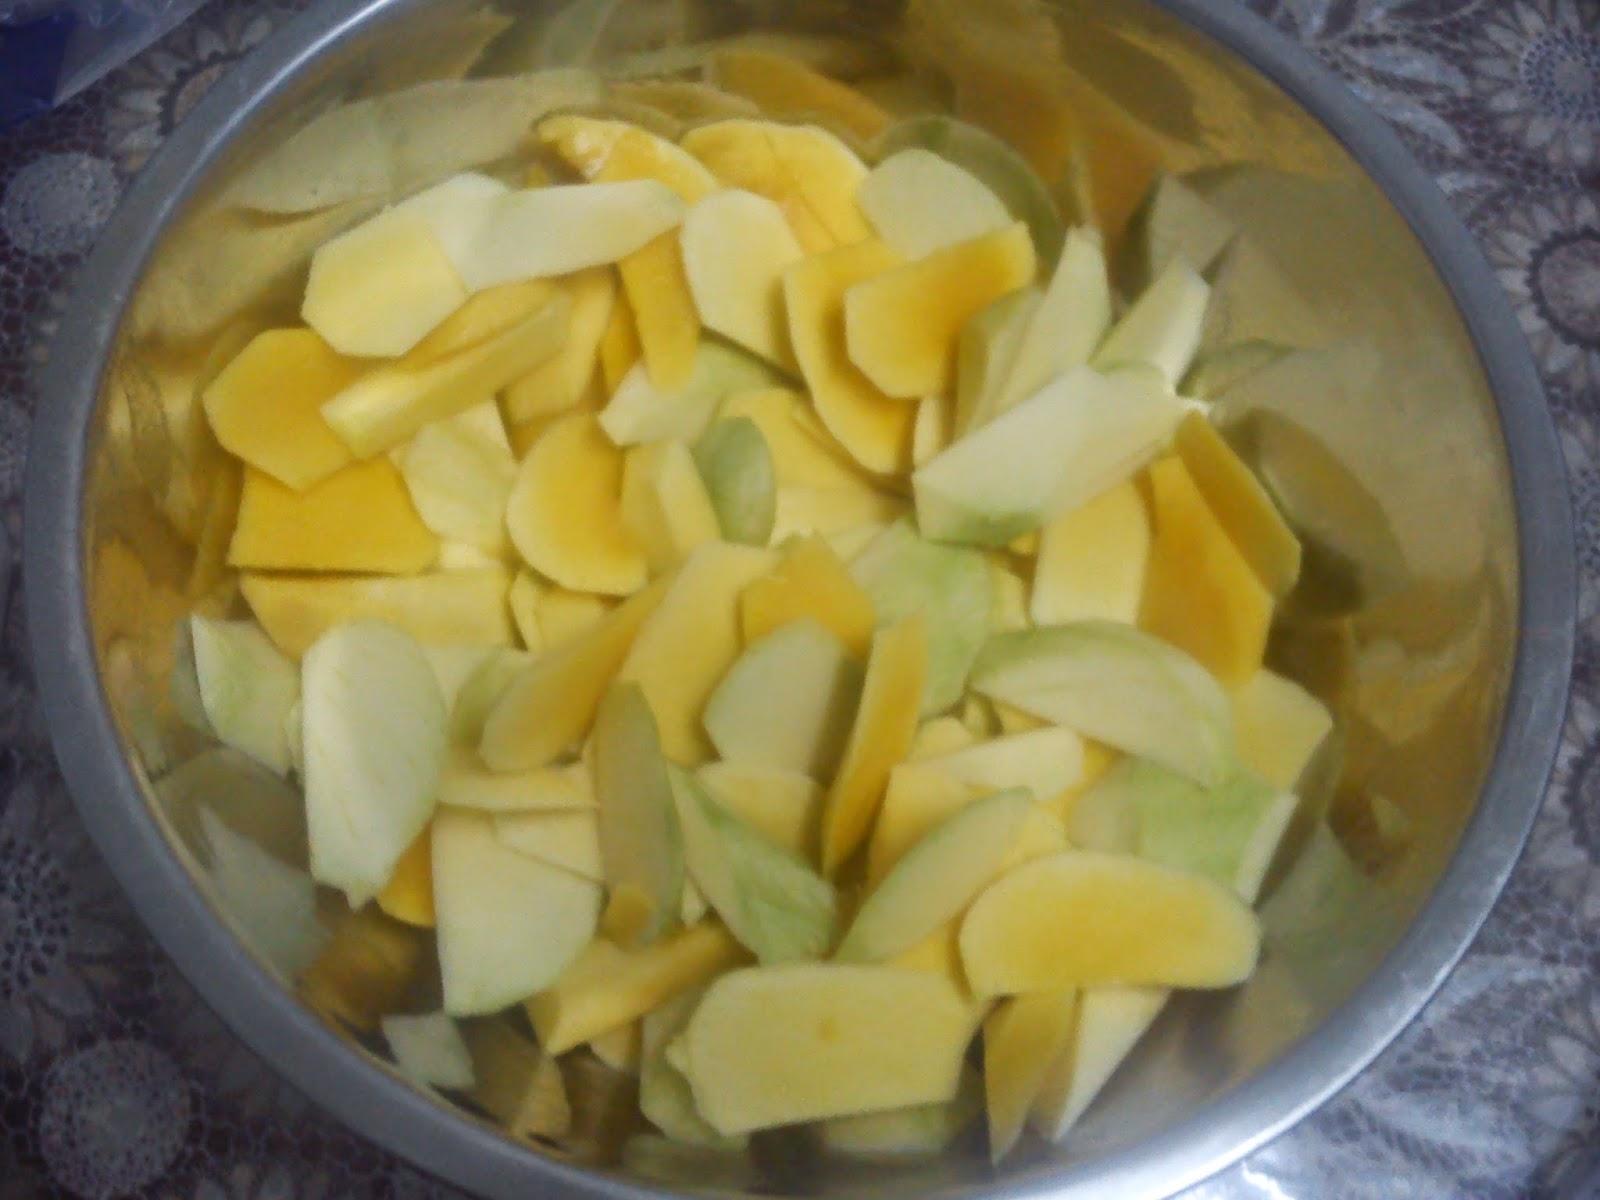 azreen zunairah resipi jeruk mangga asam boi yang super duper